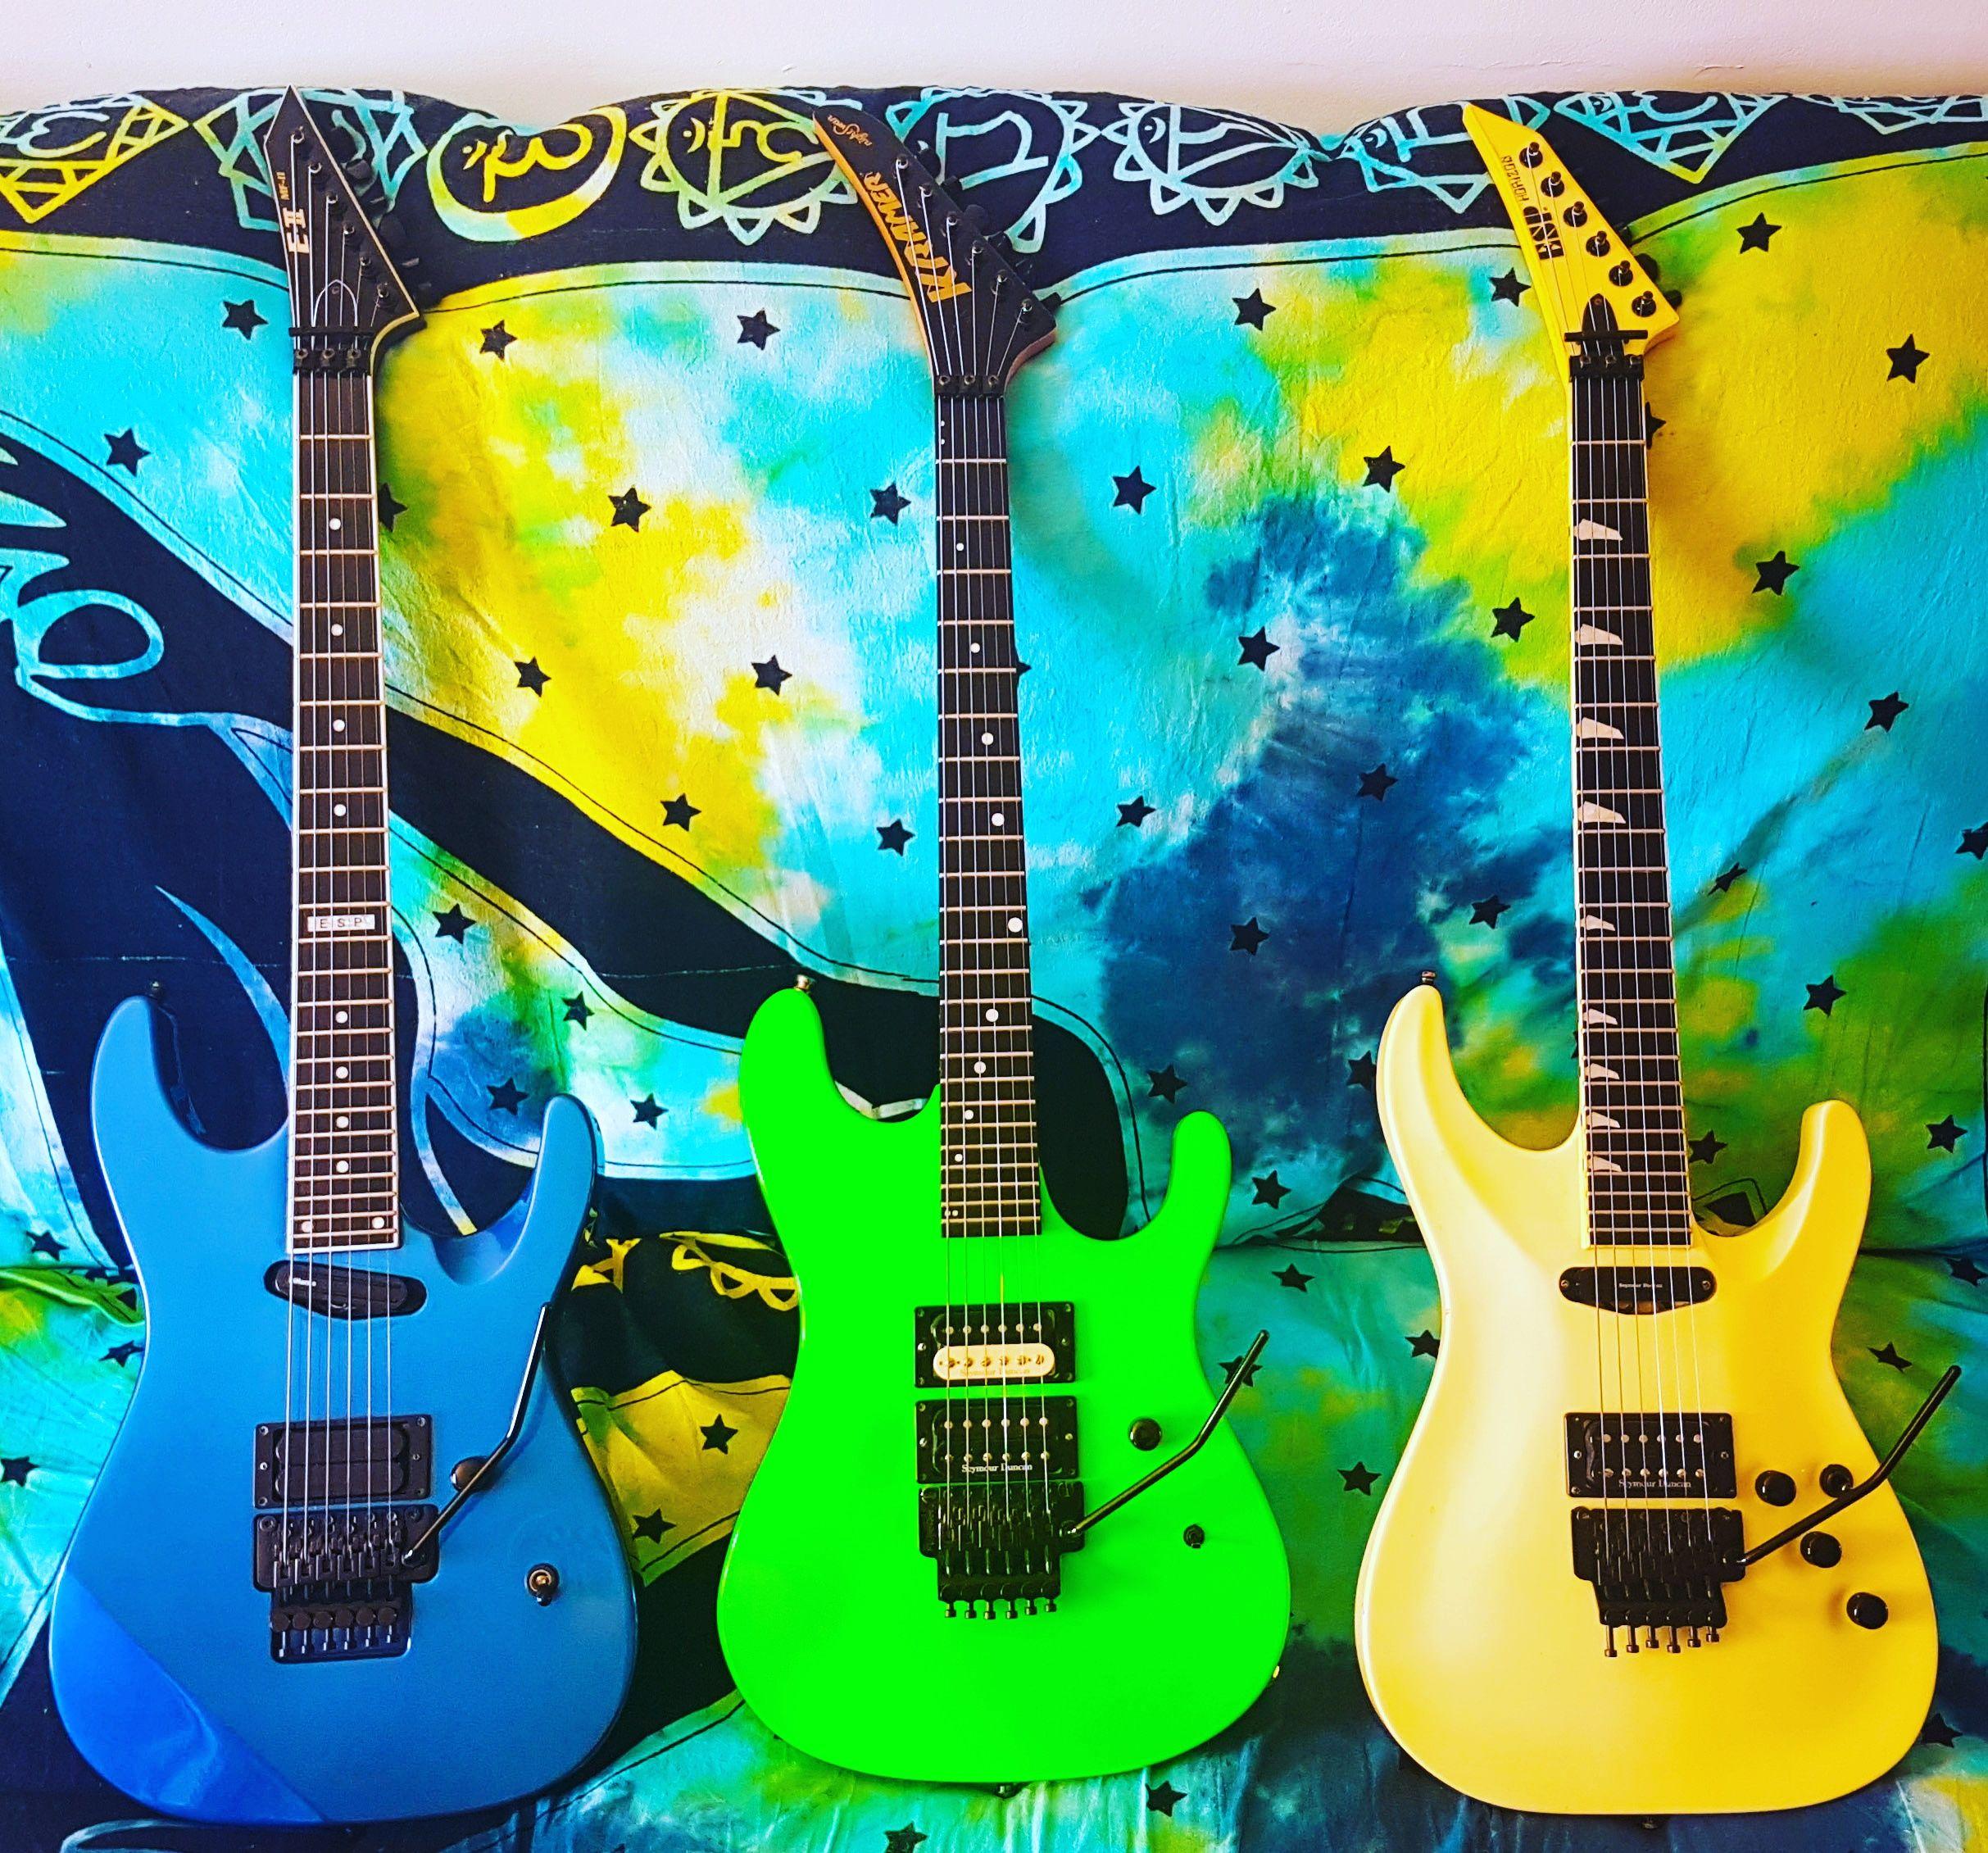 Superstrats Let S See Em Boutique Guitar Heavy Metal Guitar Guitar Design